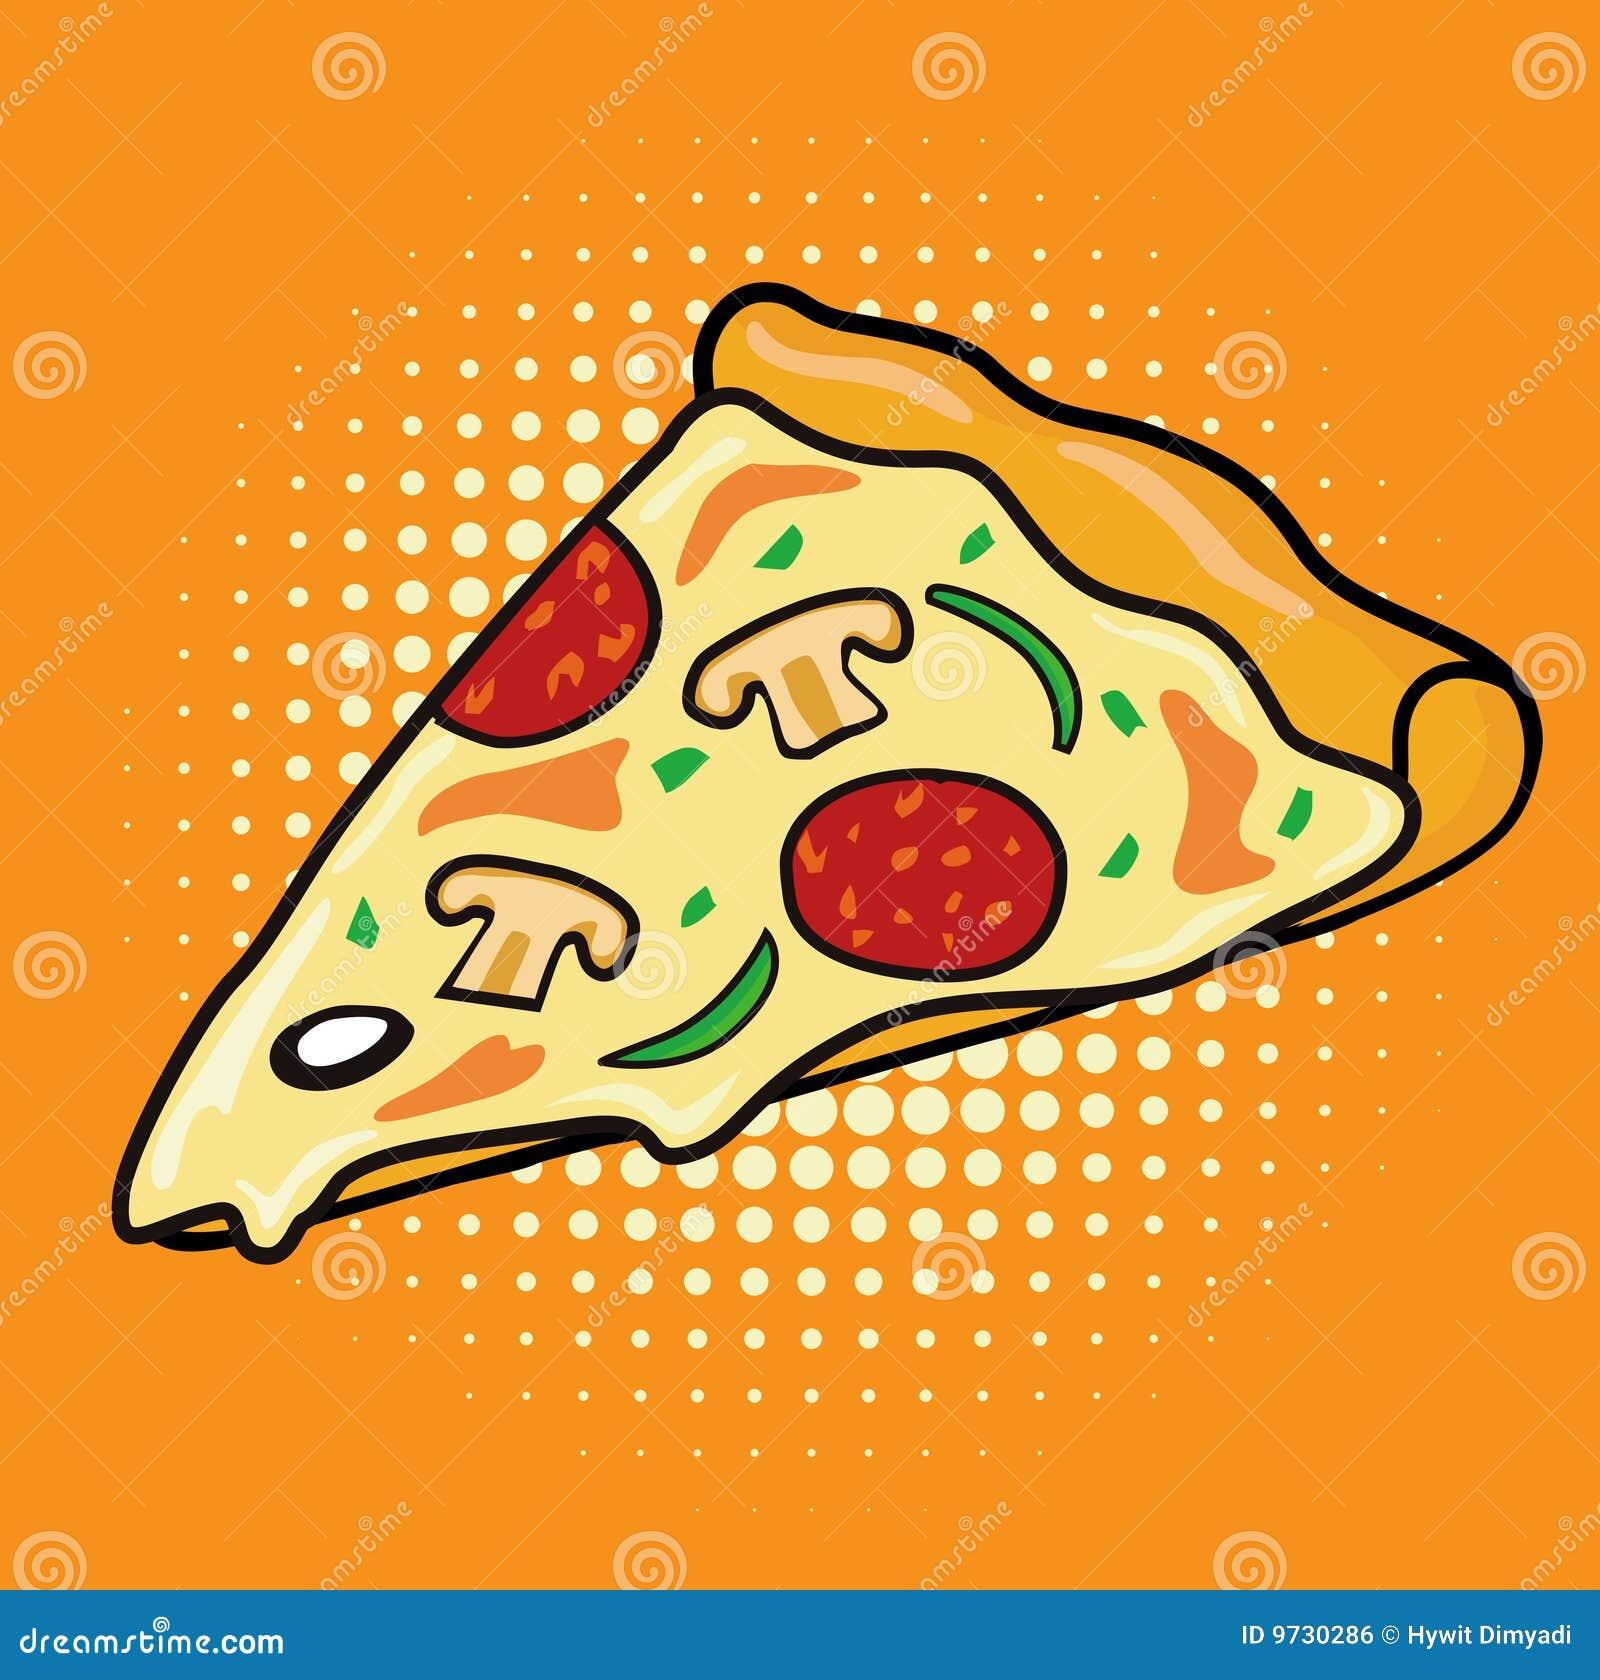 Slice Of Pepperoni Mushroom Pizza Royalty Free Stock Image - Image ...